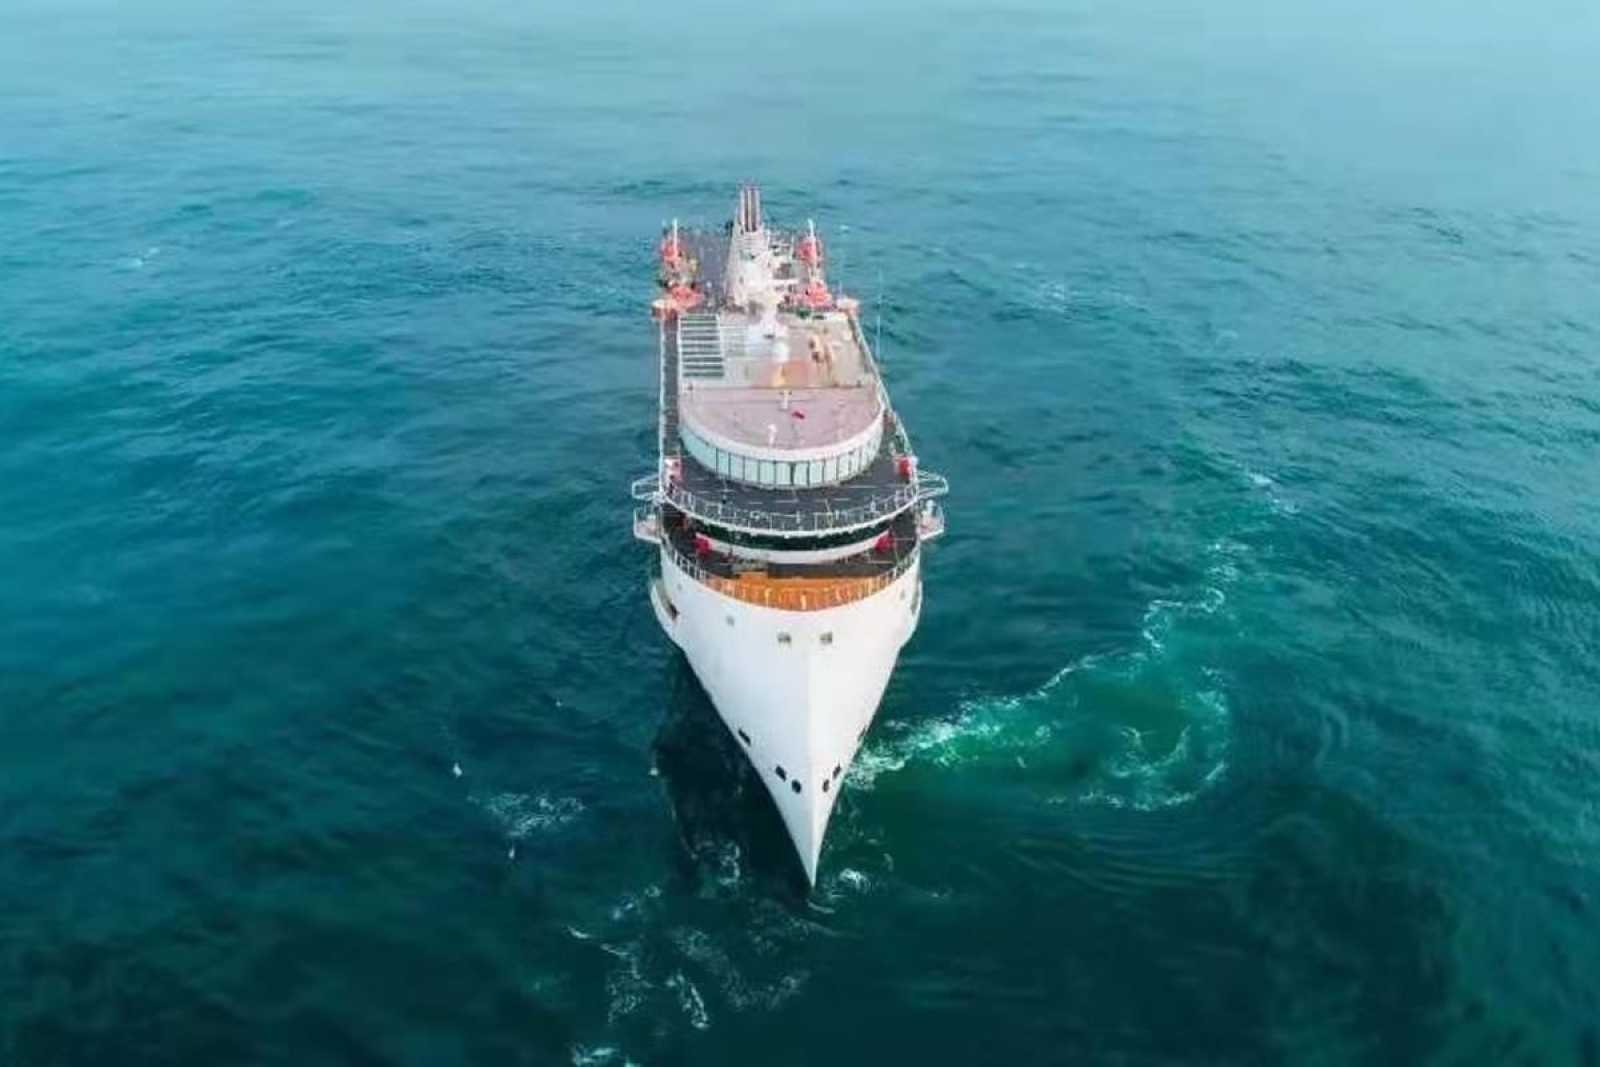 Greg Mortimer CX103 200 Pax Polar Expedition vessel Sea Trial